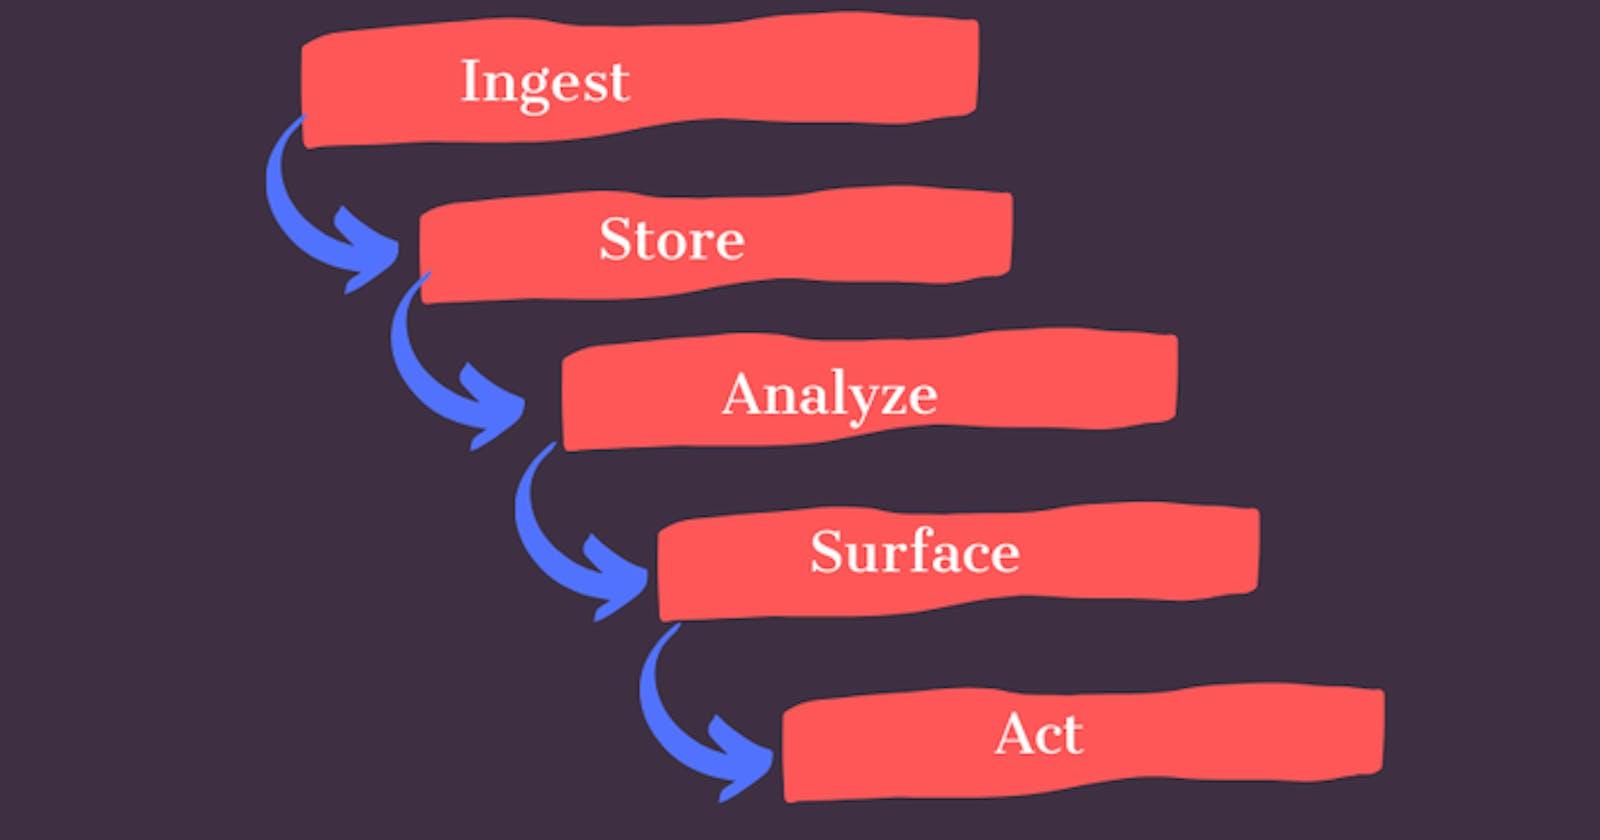 Data Lake - 5 Major Principles